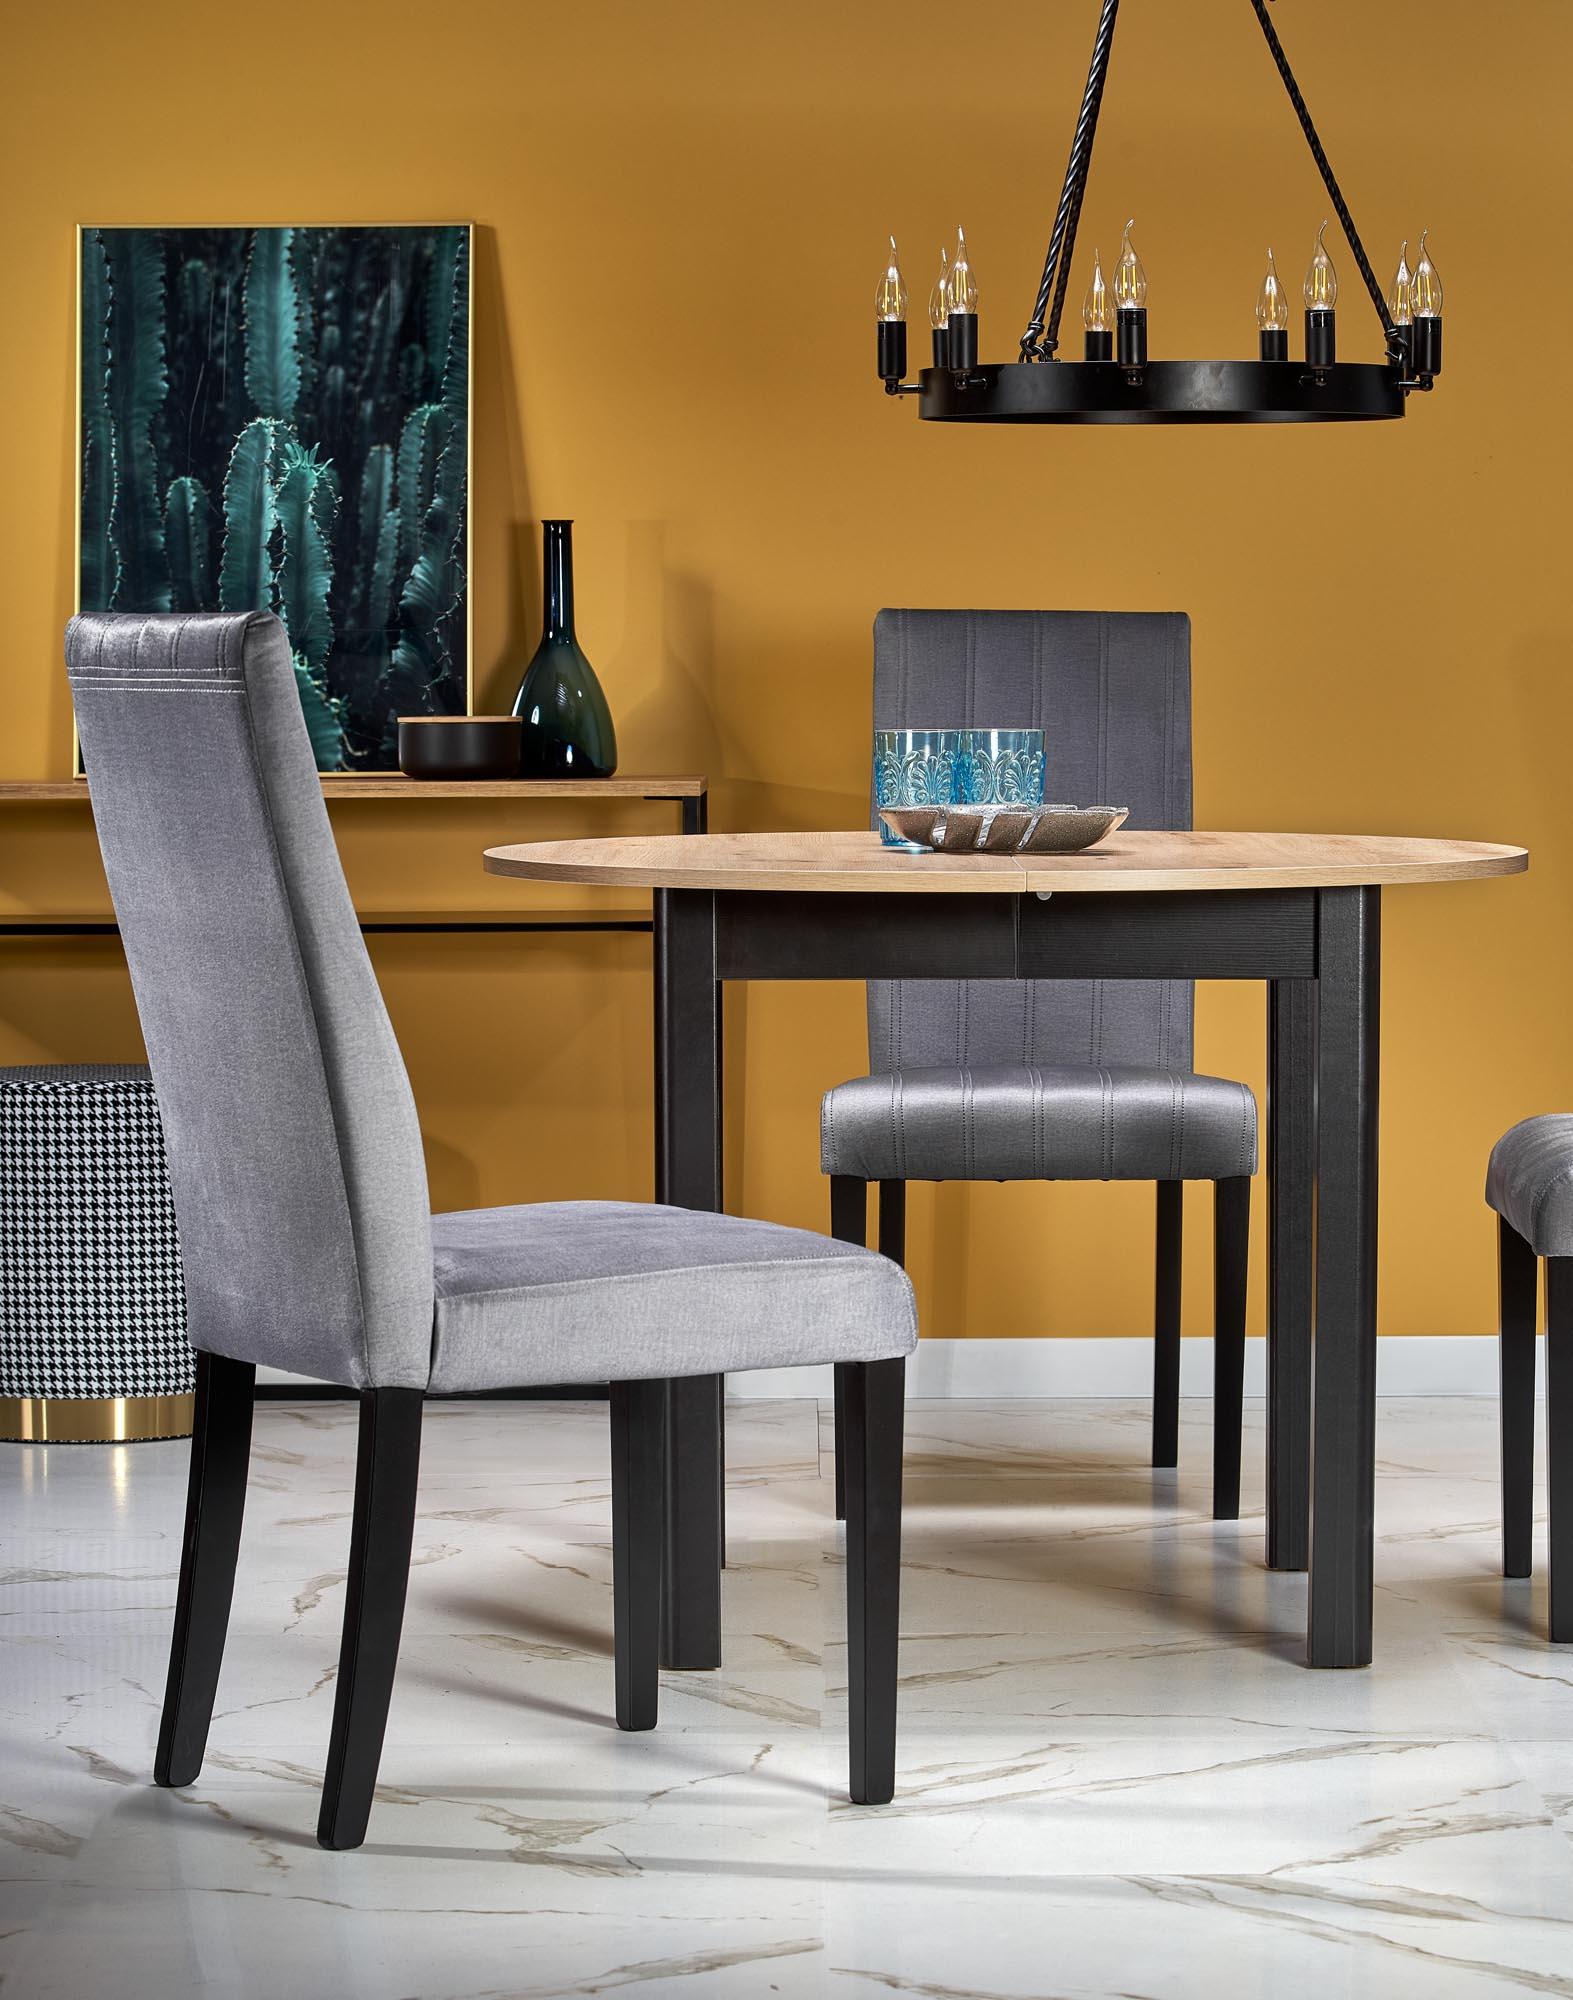 RINGO doska dub artisan, nohy - čierne (102-142x102x76 cm)